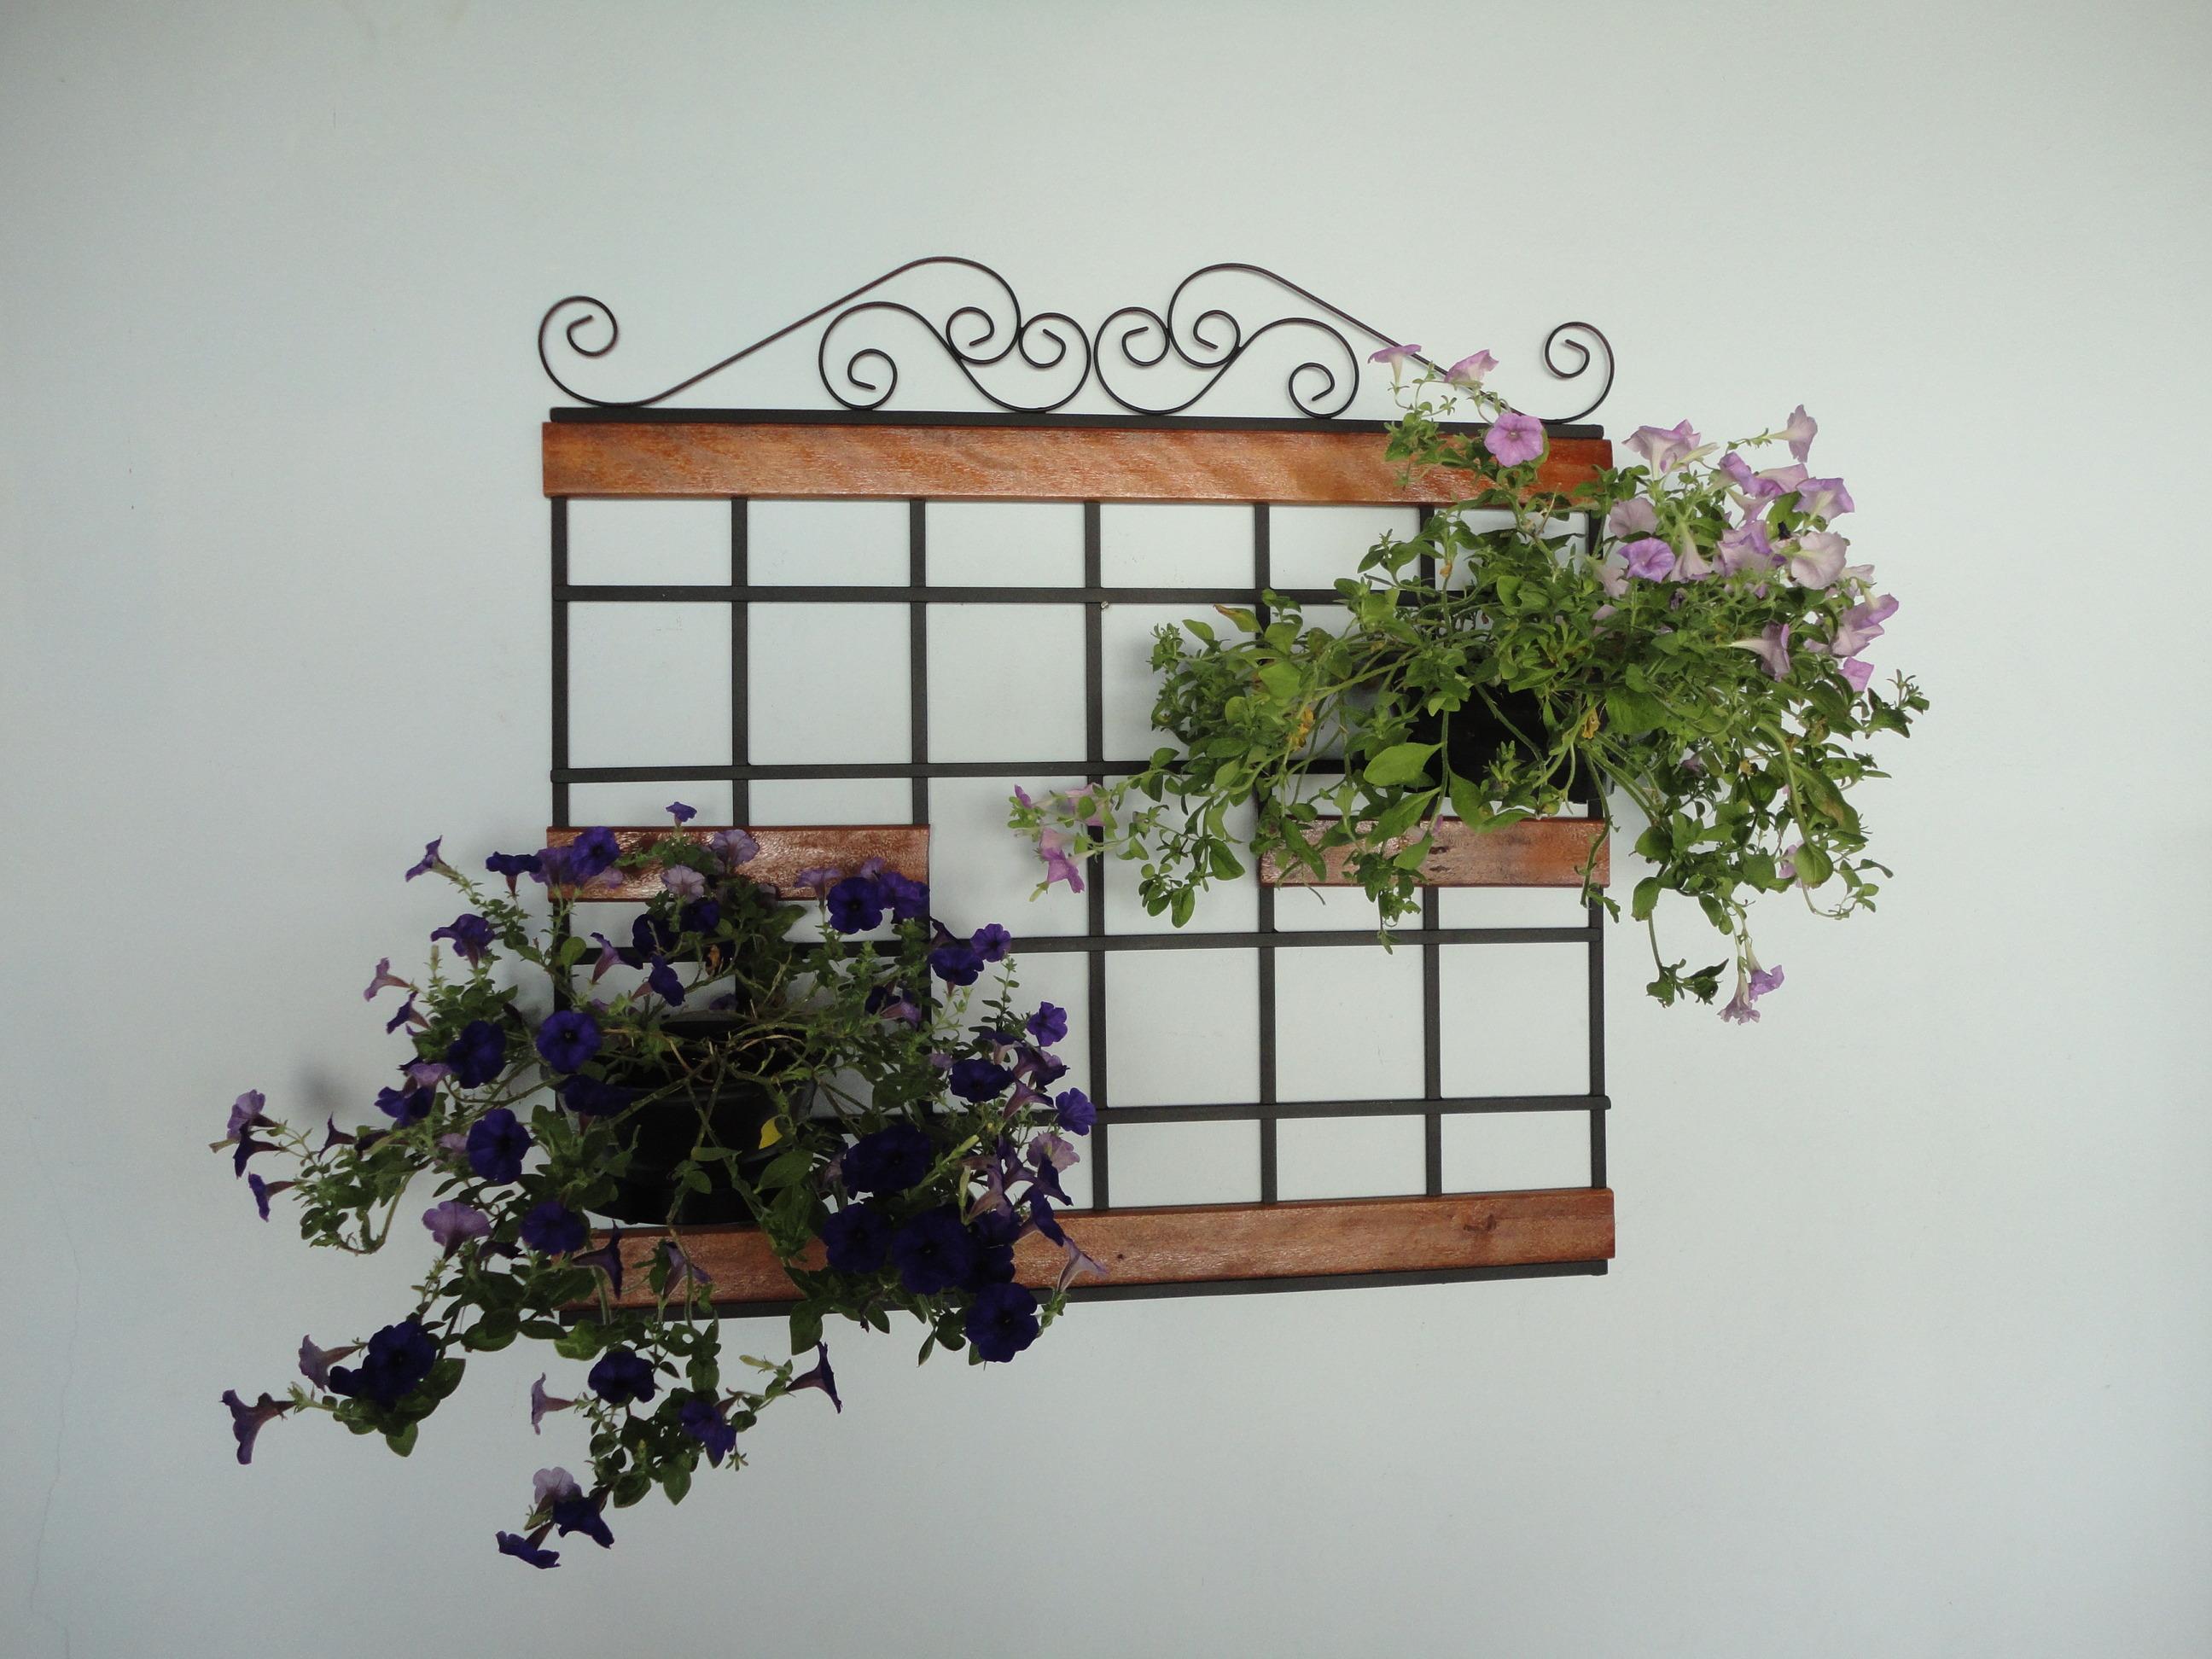 trelica jardim vertical:trelica para jardim vertical trelica para jardim vertical trelica para